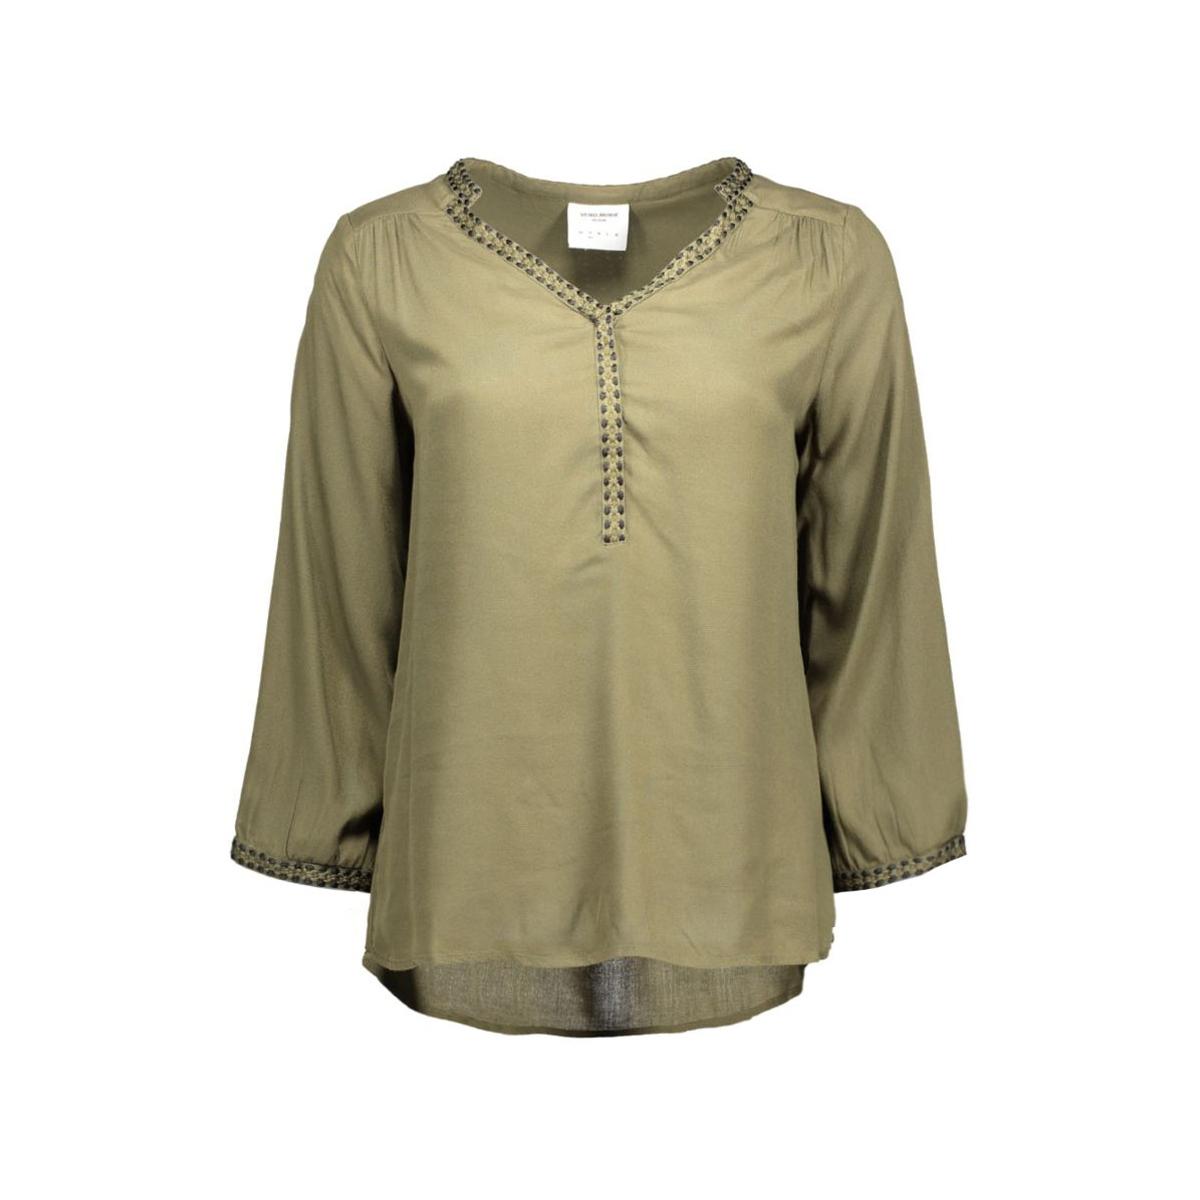 vmcharlotte 3/4 top dnm 10161642 vero moda blouse ivy green/black tape